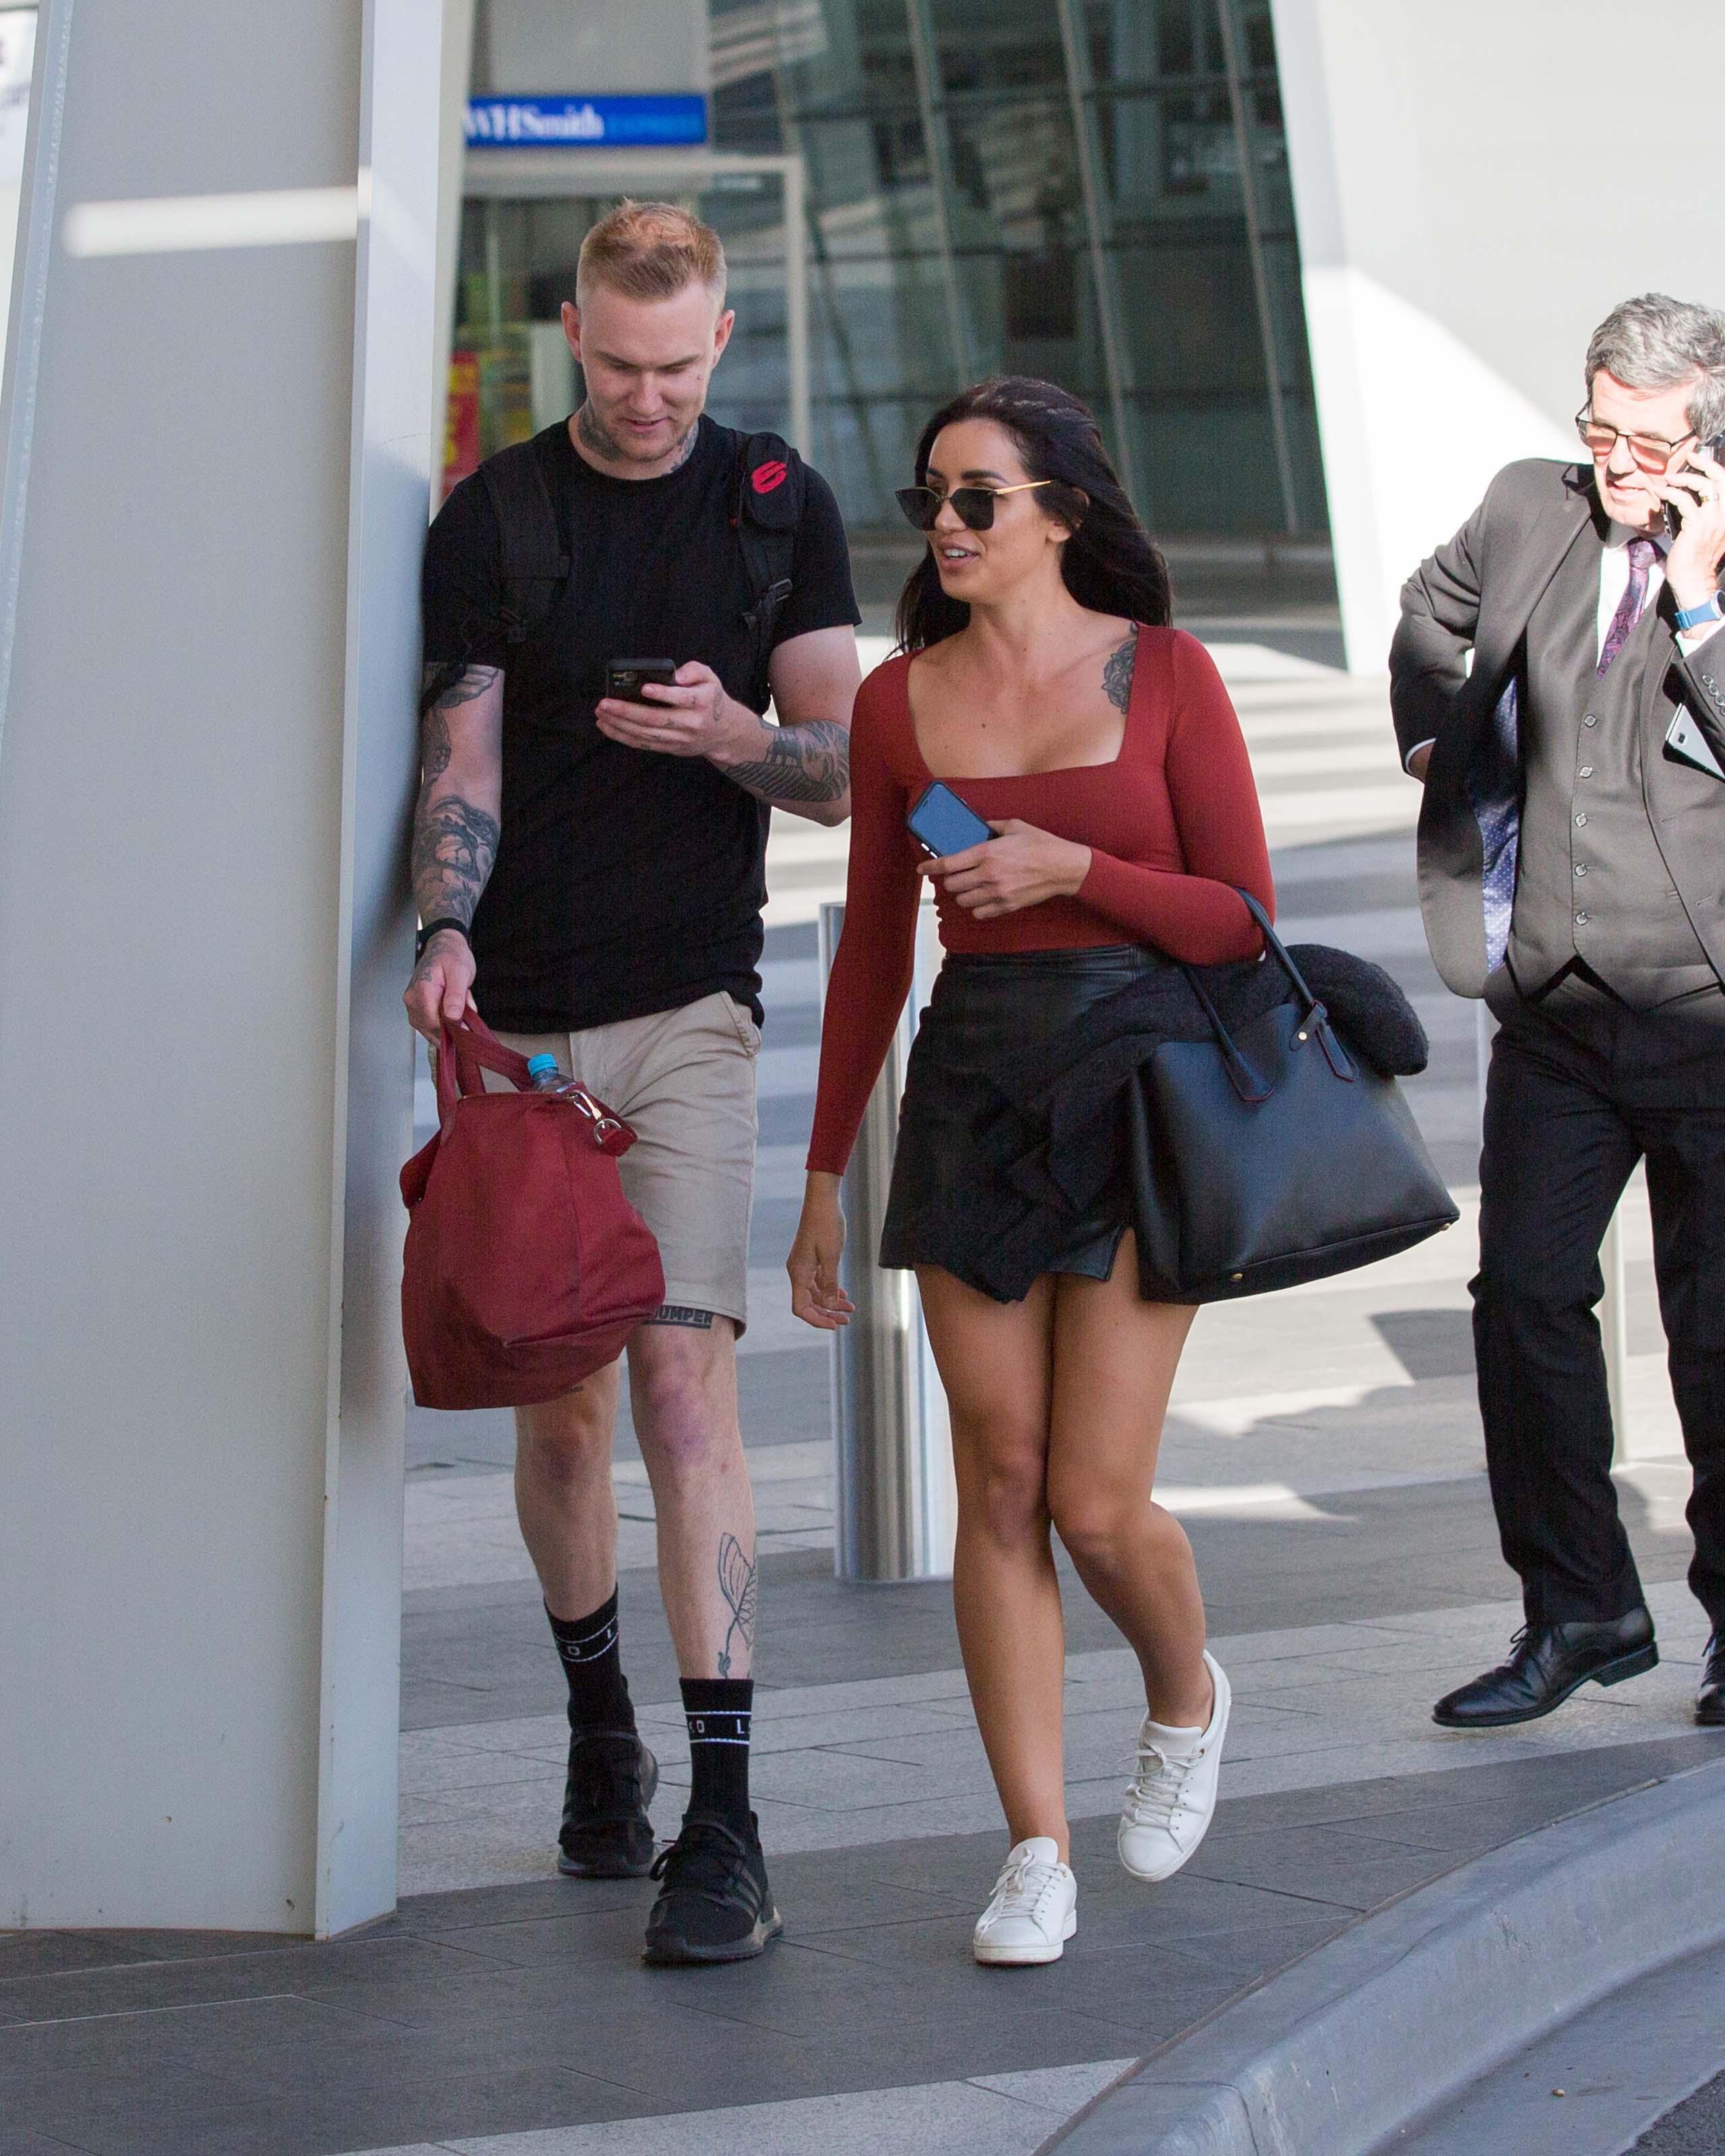 Vanessa Sierra at Adelaide airport